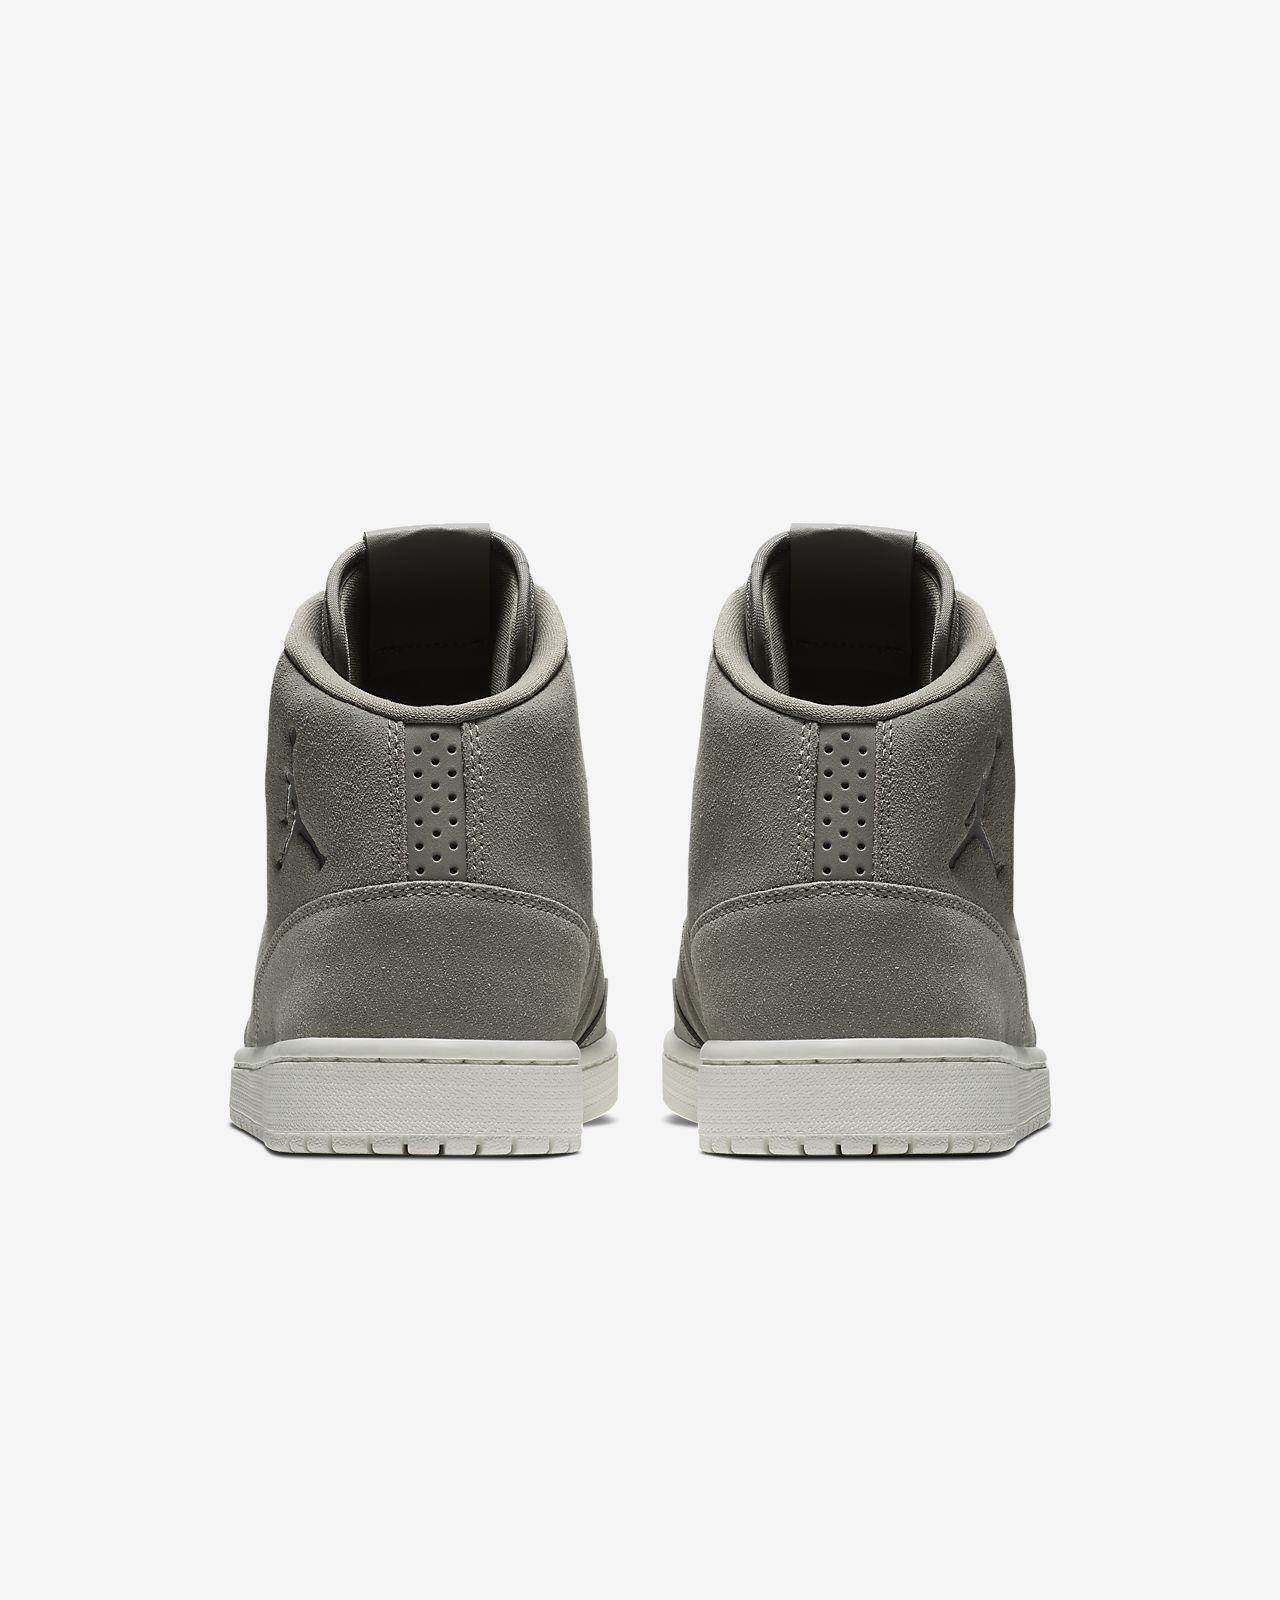 faa37afeb39c62 Low Resolution Jordan Executive Men s Shoe Jordan Executive Men s Shoe